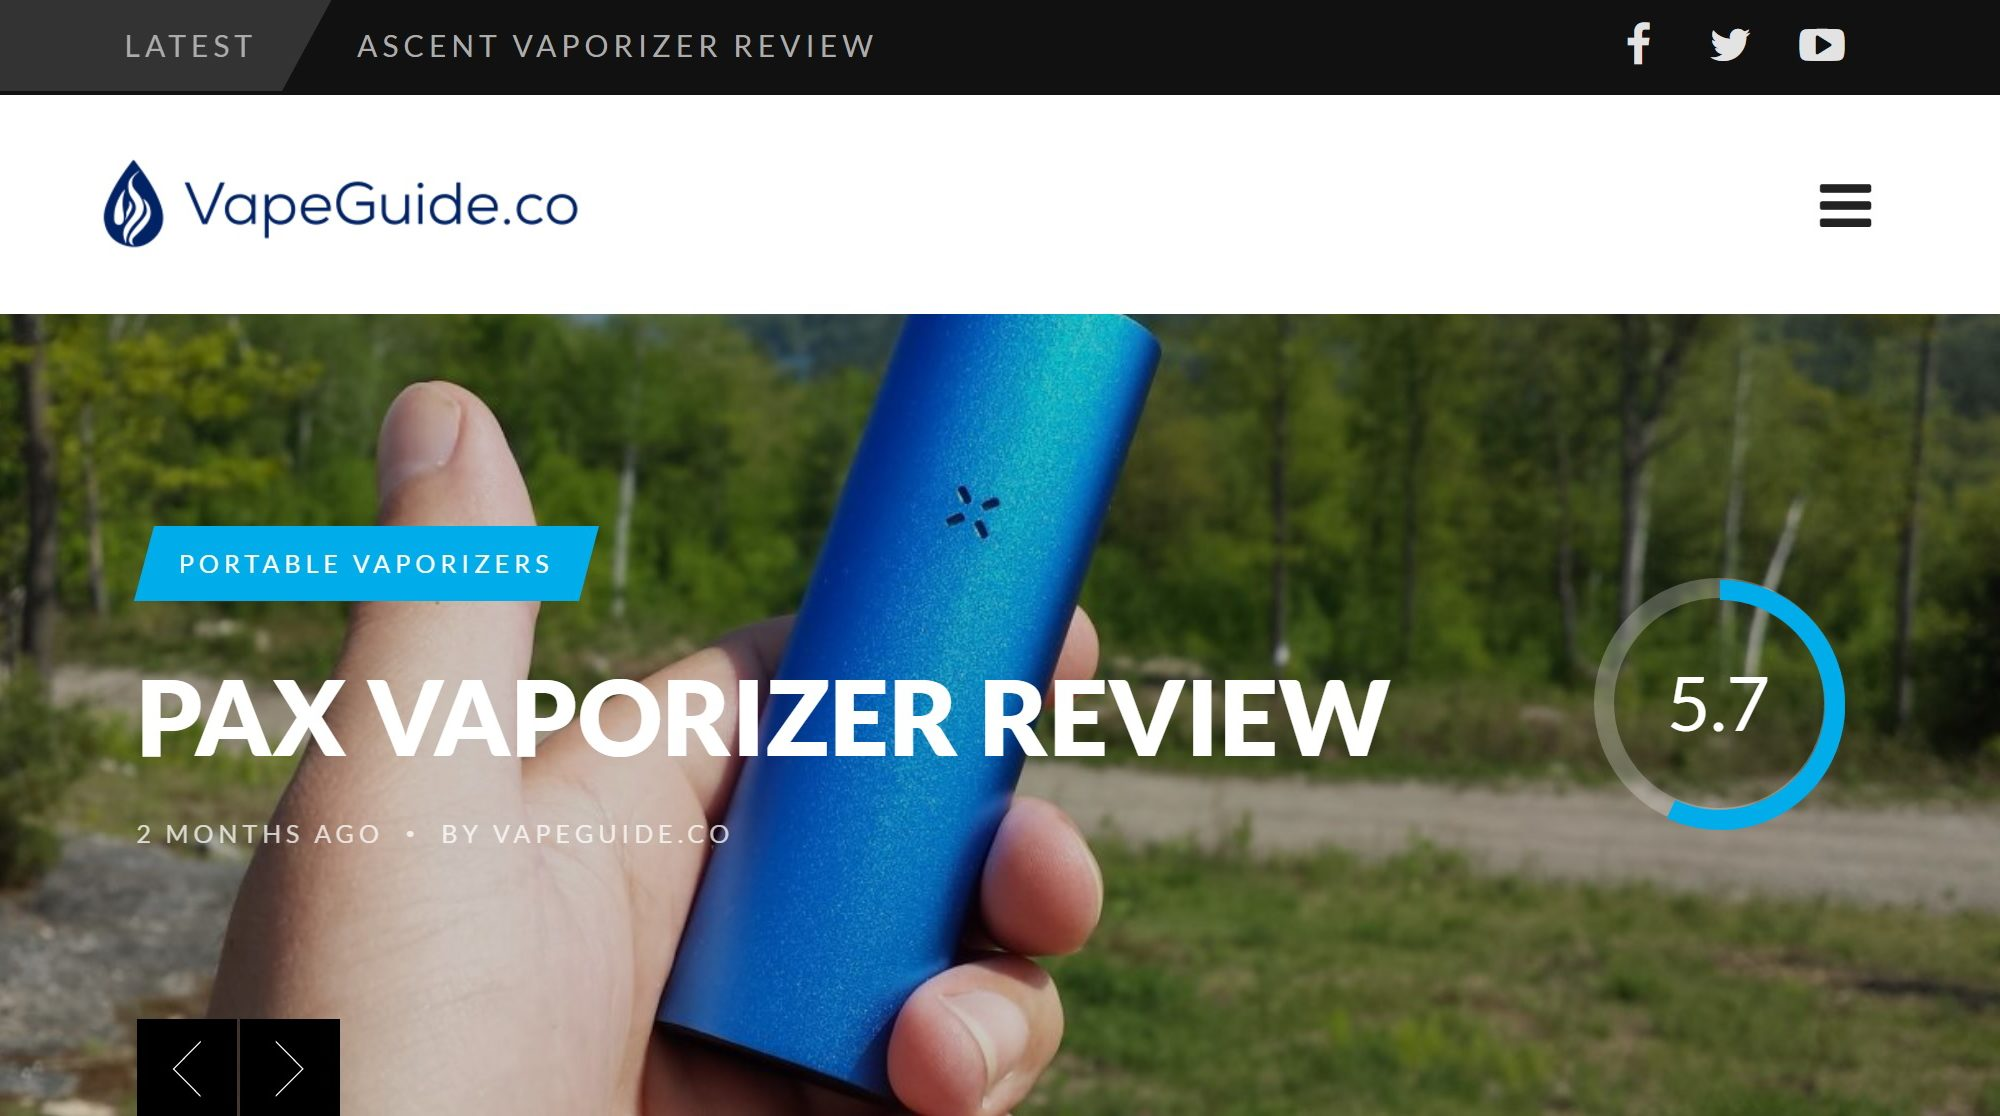 Vape Guide (VapeGuide.co) Website